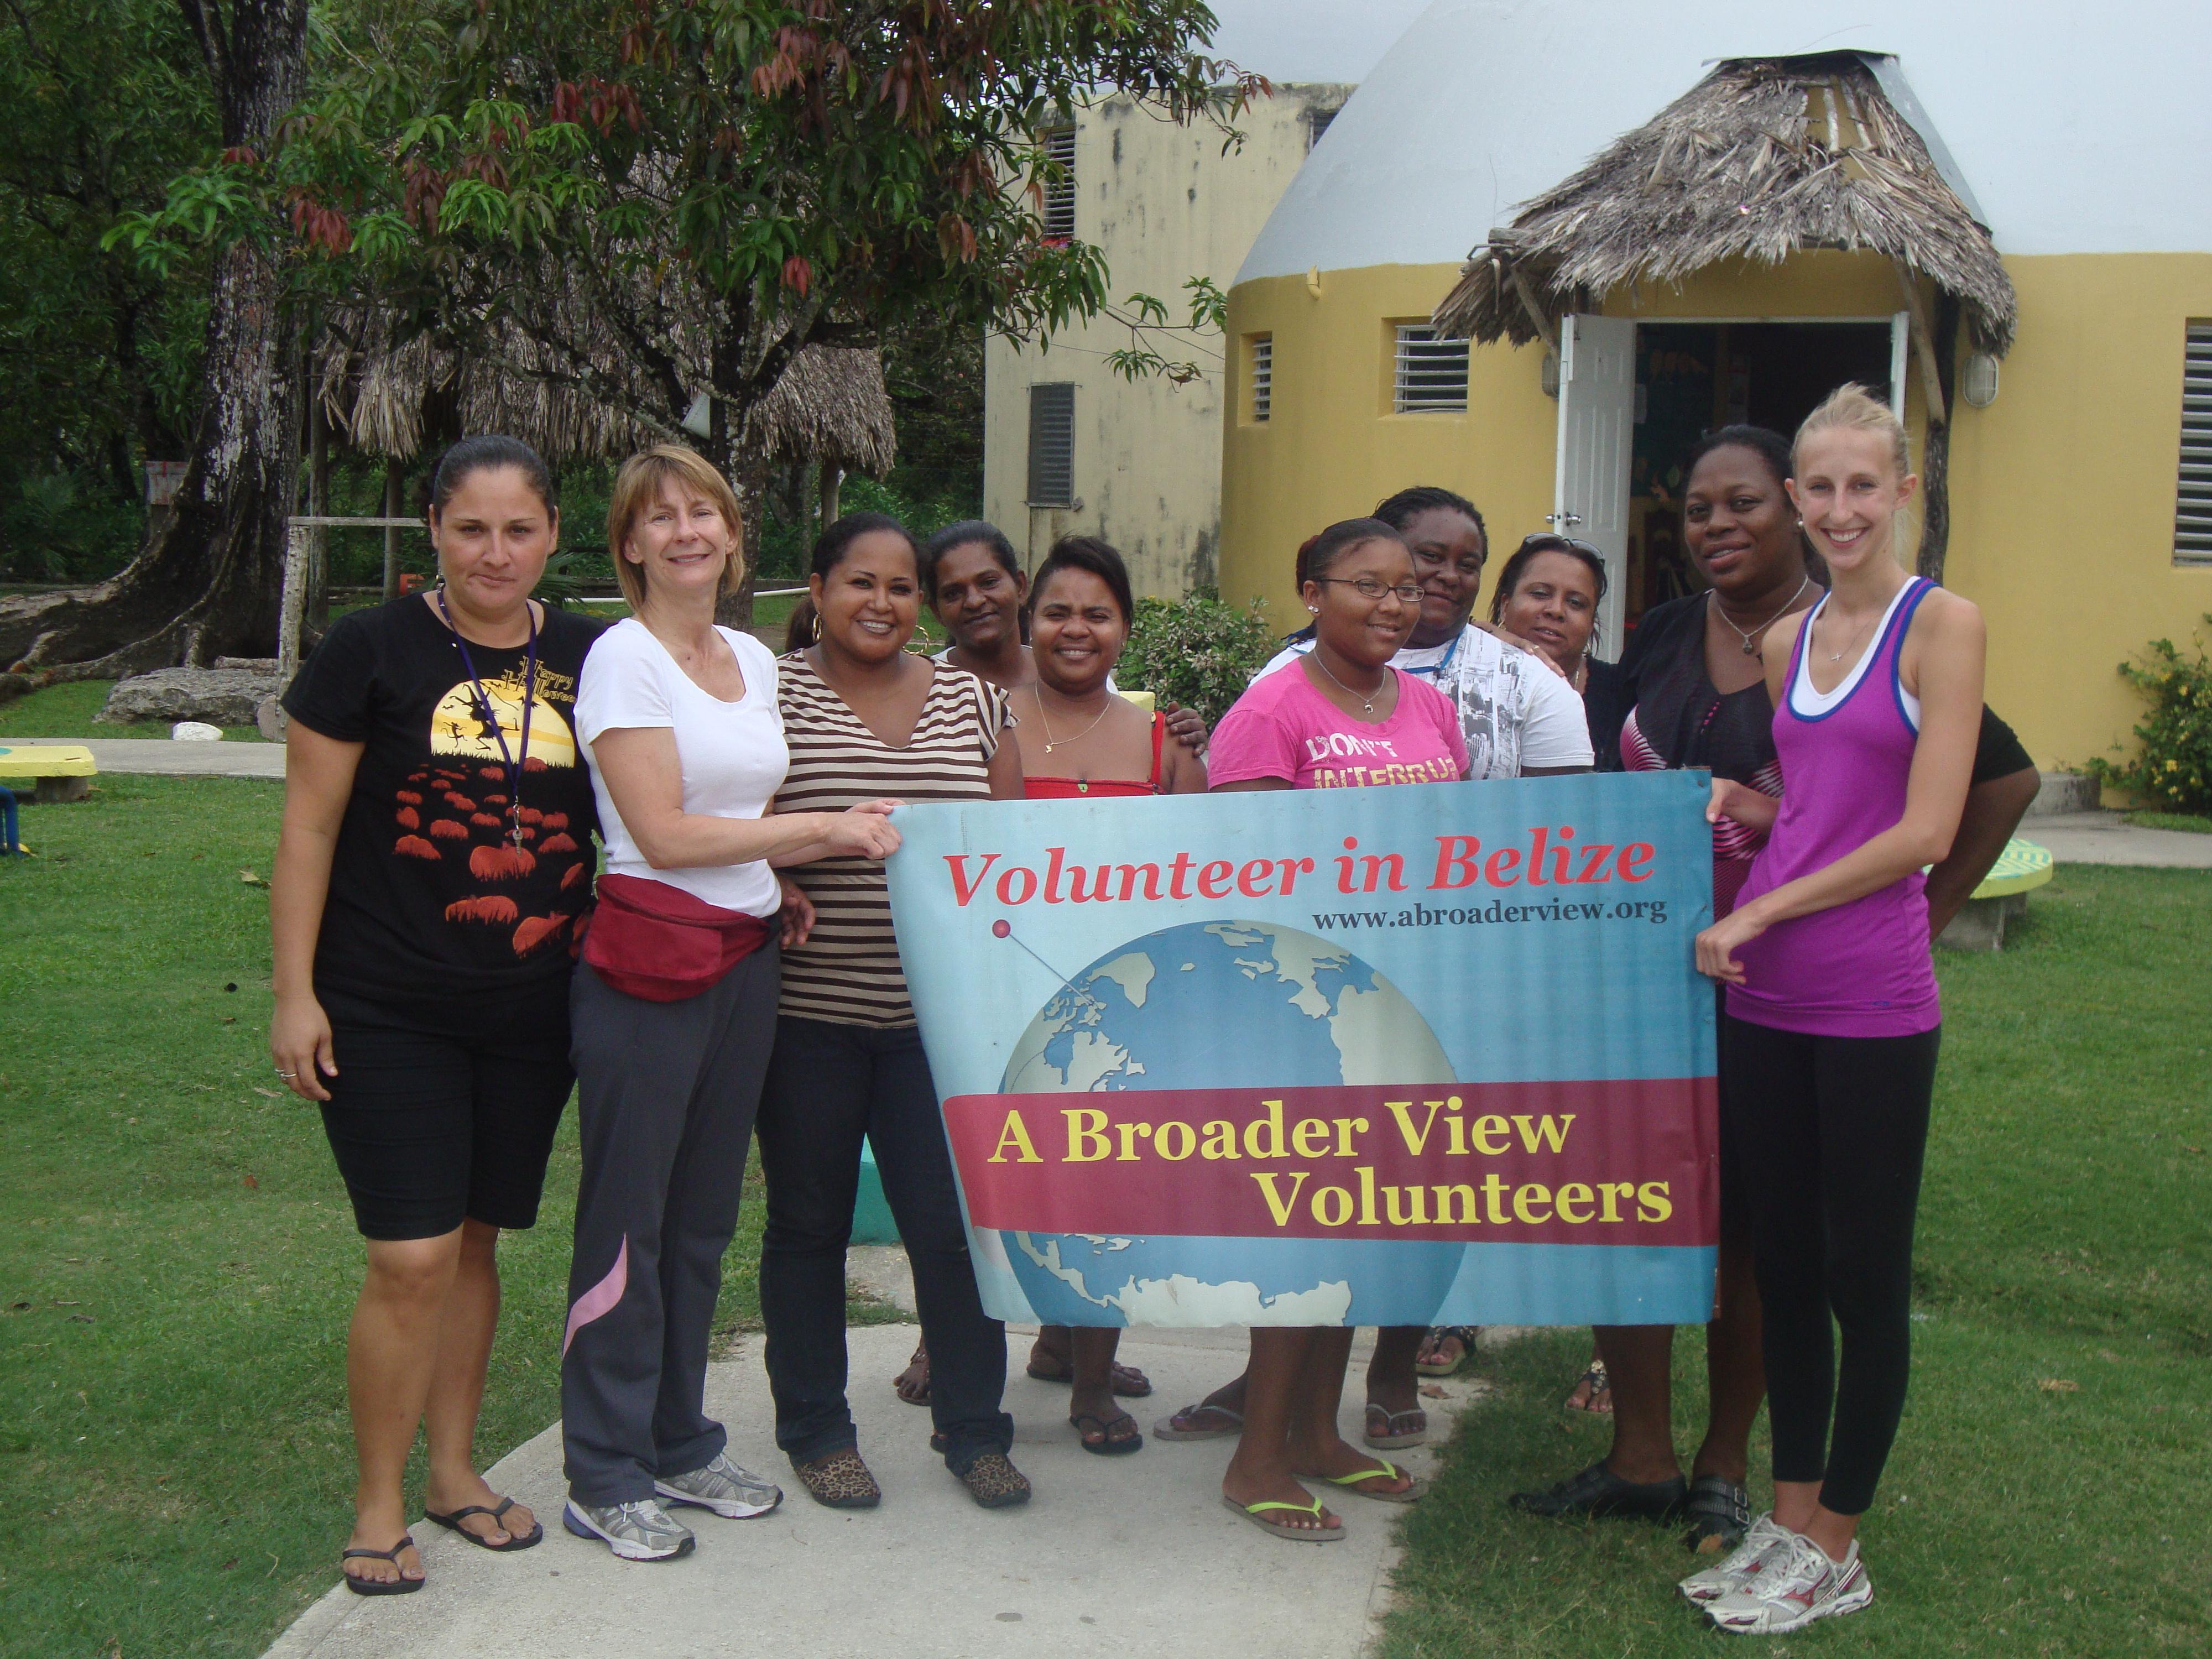 Summer Program - Community Service | Volunteer in BELIZE - Orphanage and Teaching Program with A Broader View Volunteers